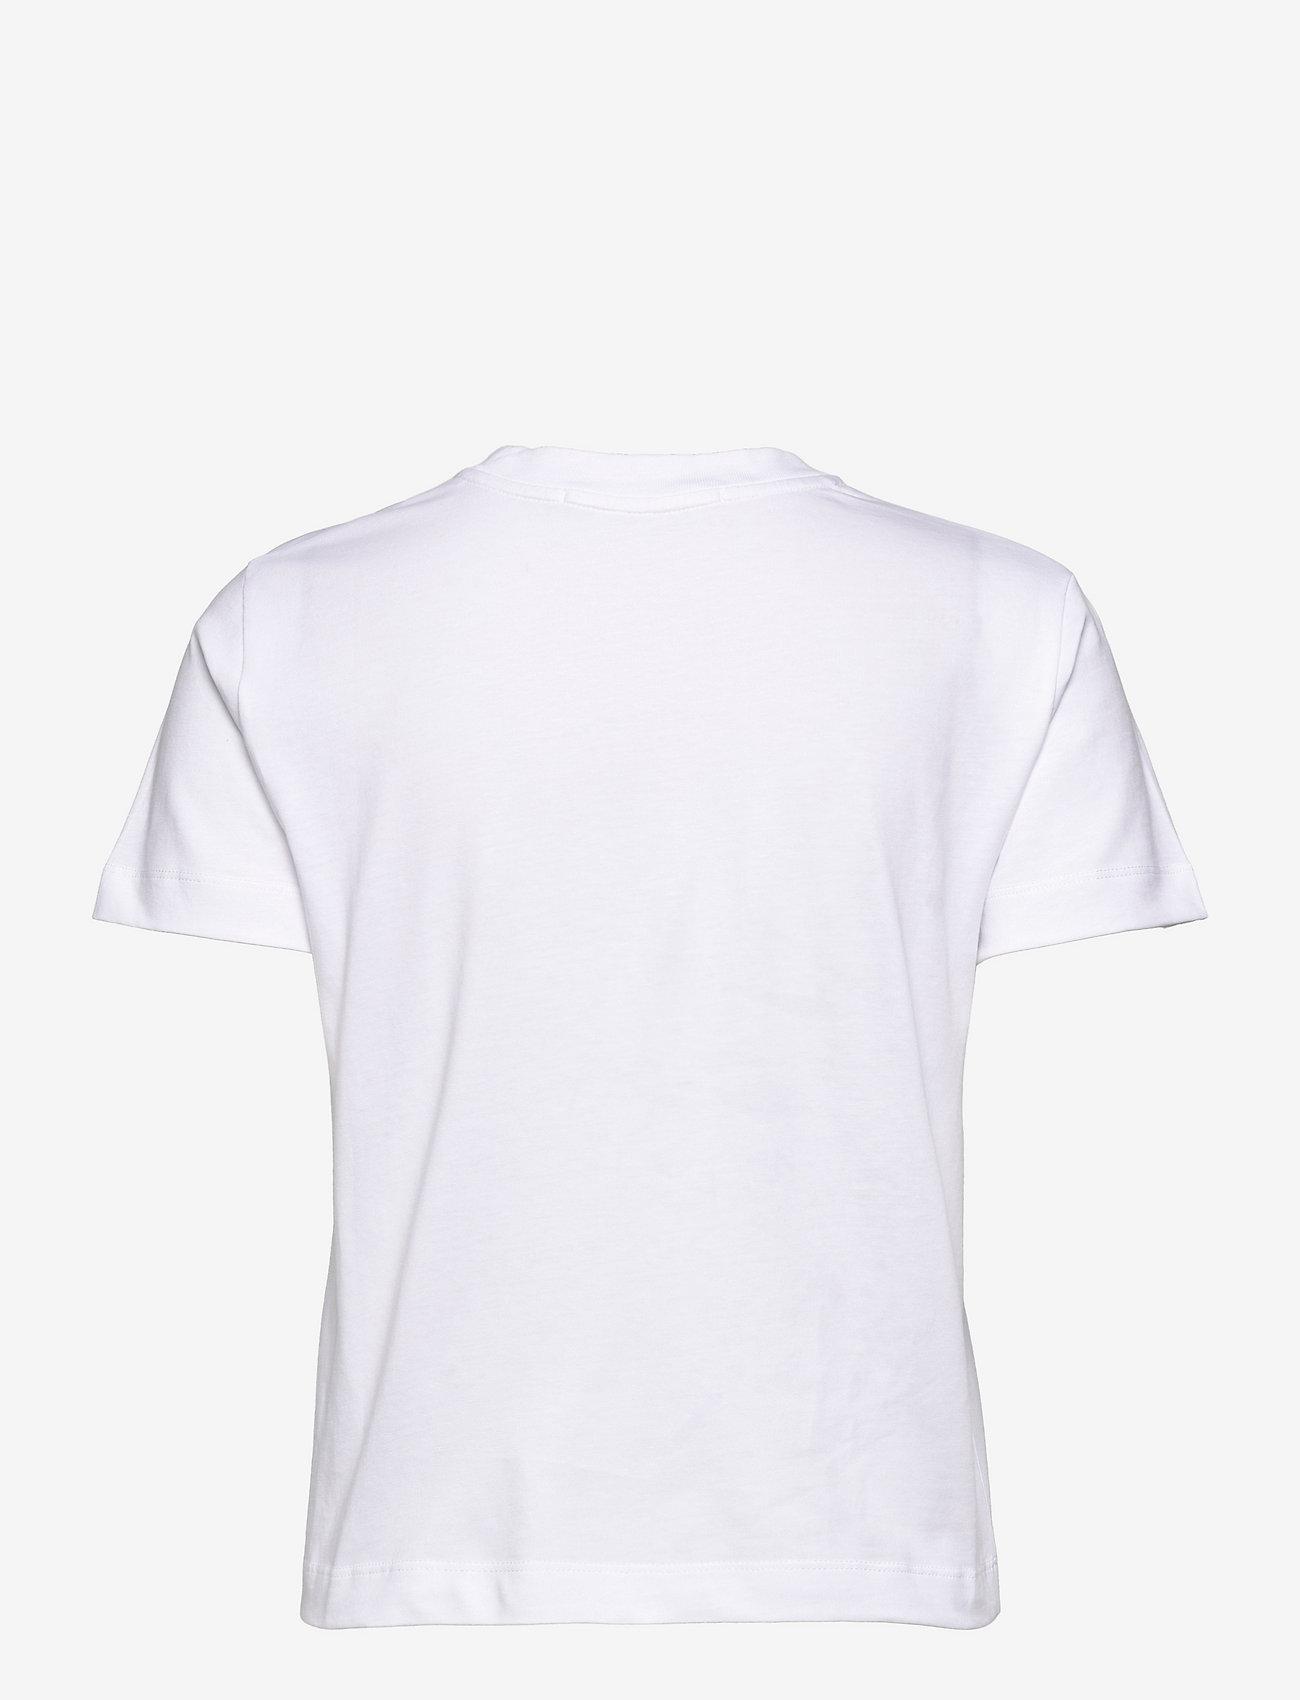 Calvin Klein Jeans - MULTICOLORED LOGO TEE - t-shirts - bright white - 1